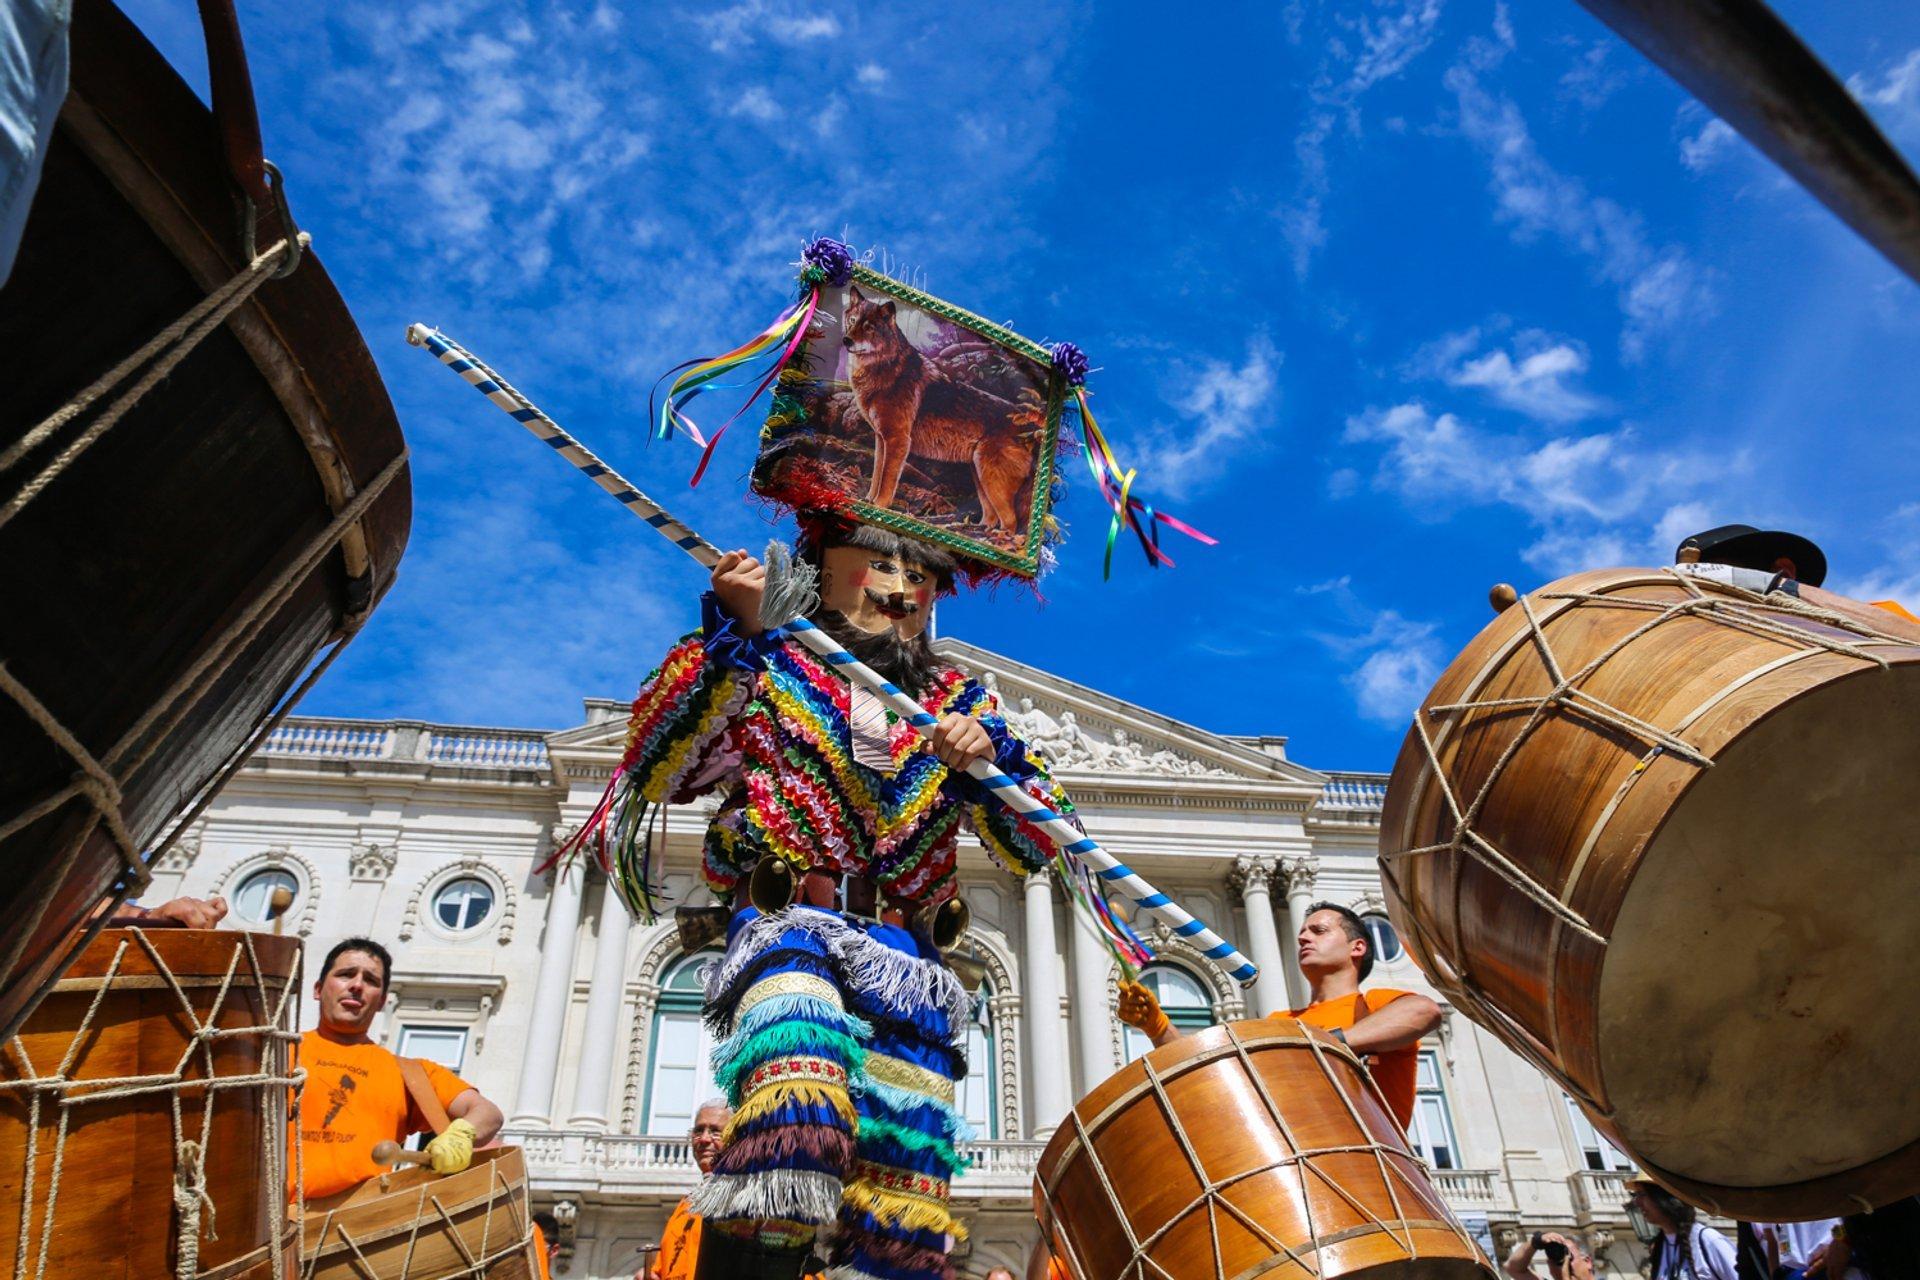 Festival of Iberian Mask (Festival Internacional da Mascára Ibérica FIMI) in Lisbon 2019 - Best Time